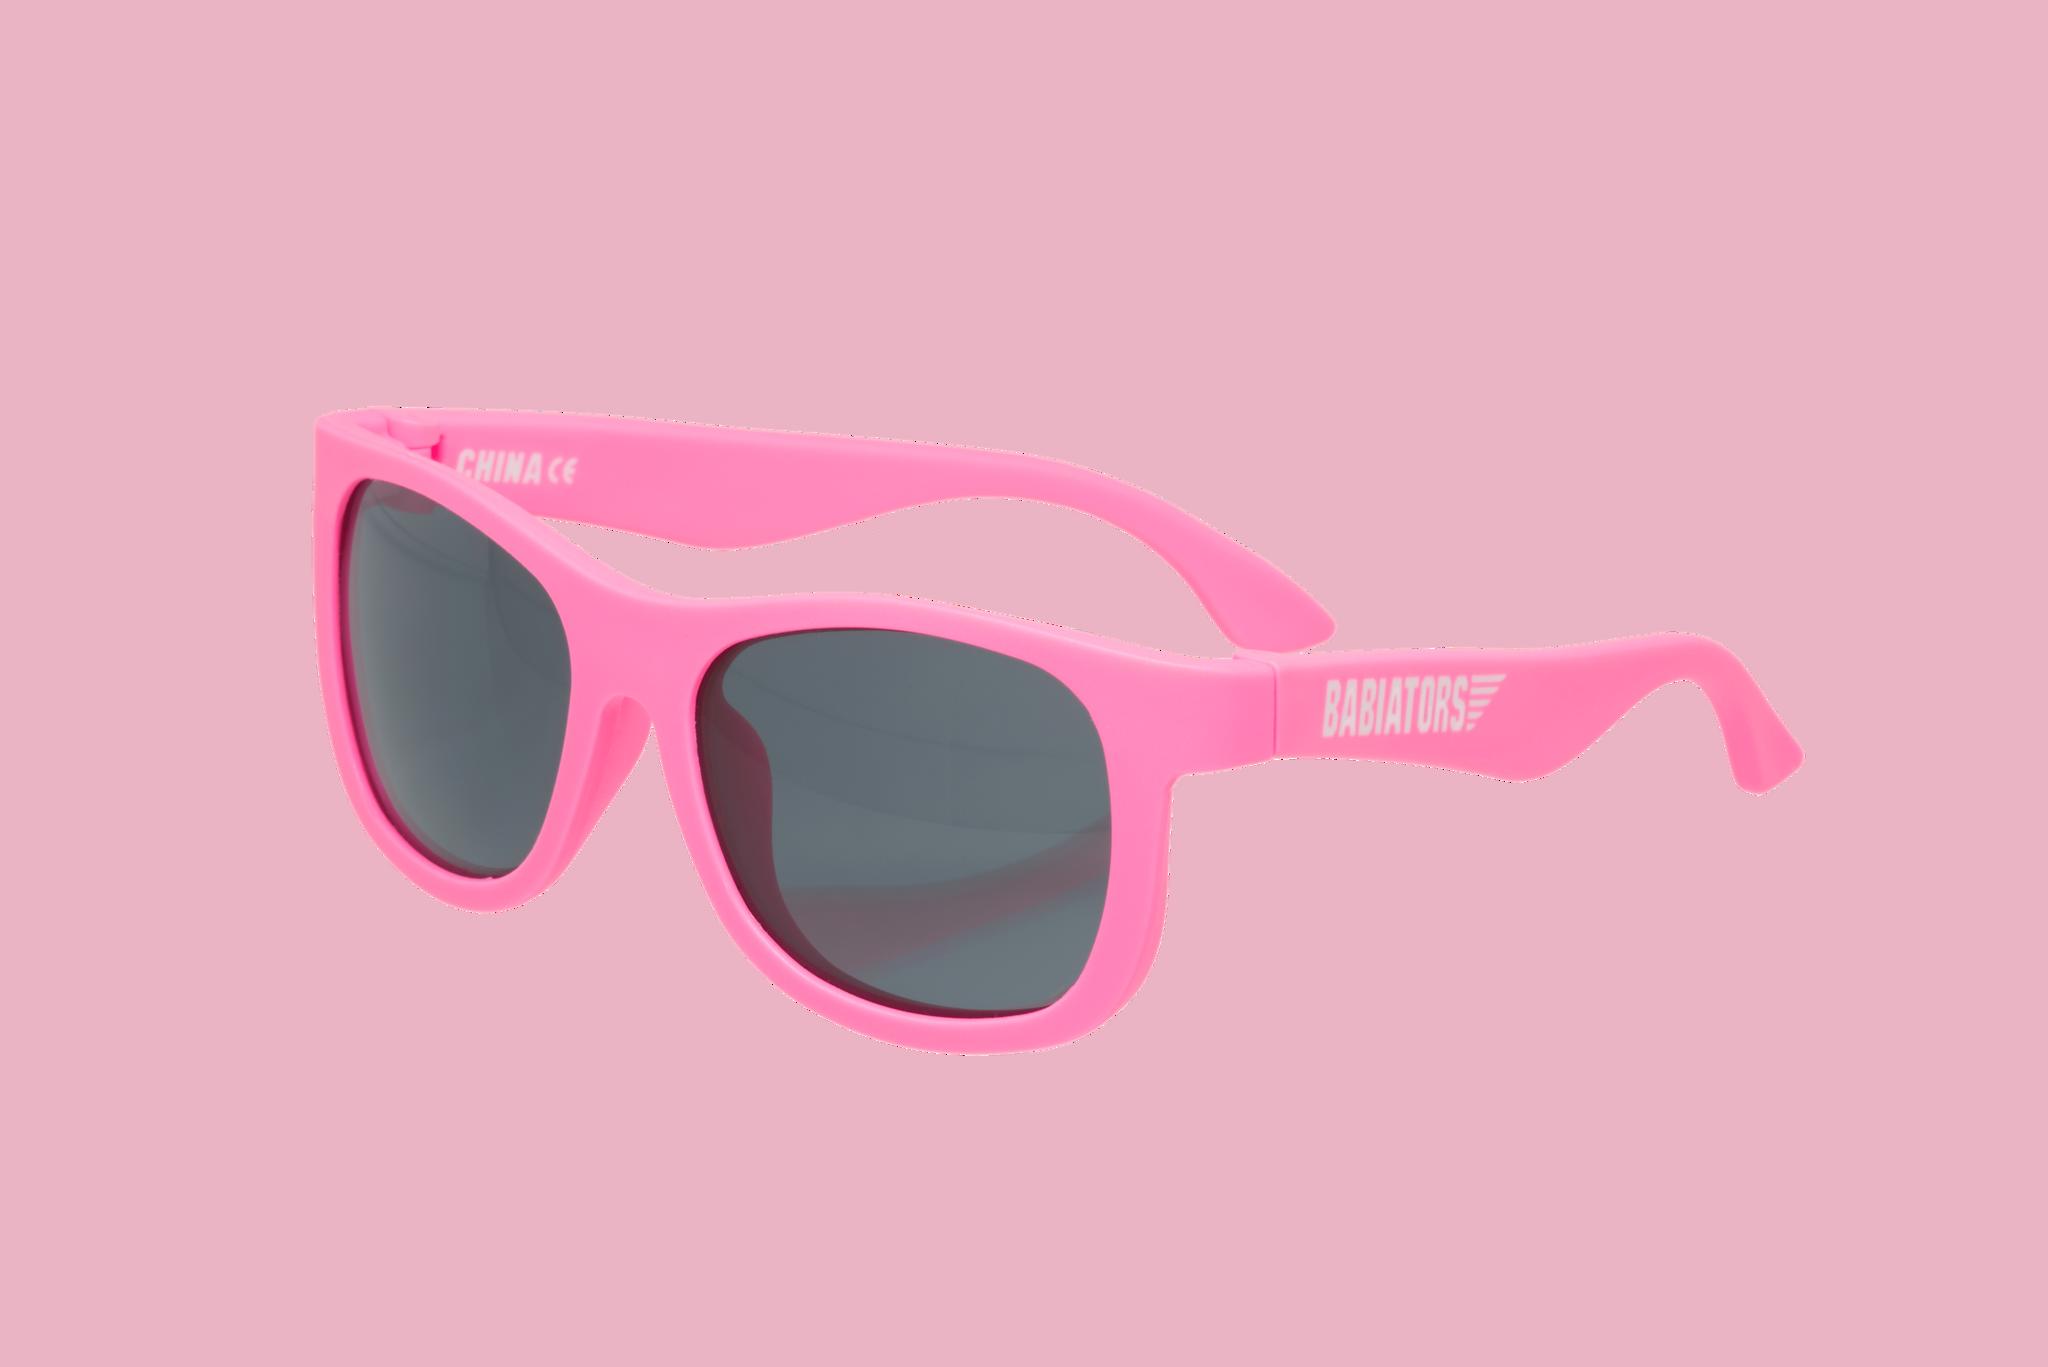 Babiators Sunglasses - Think Pink Navgiators